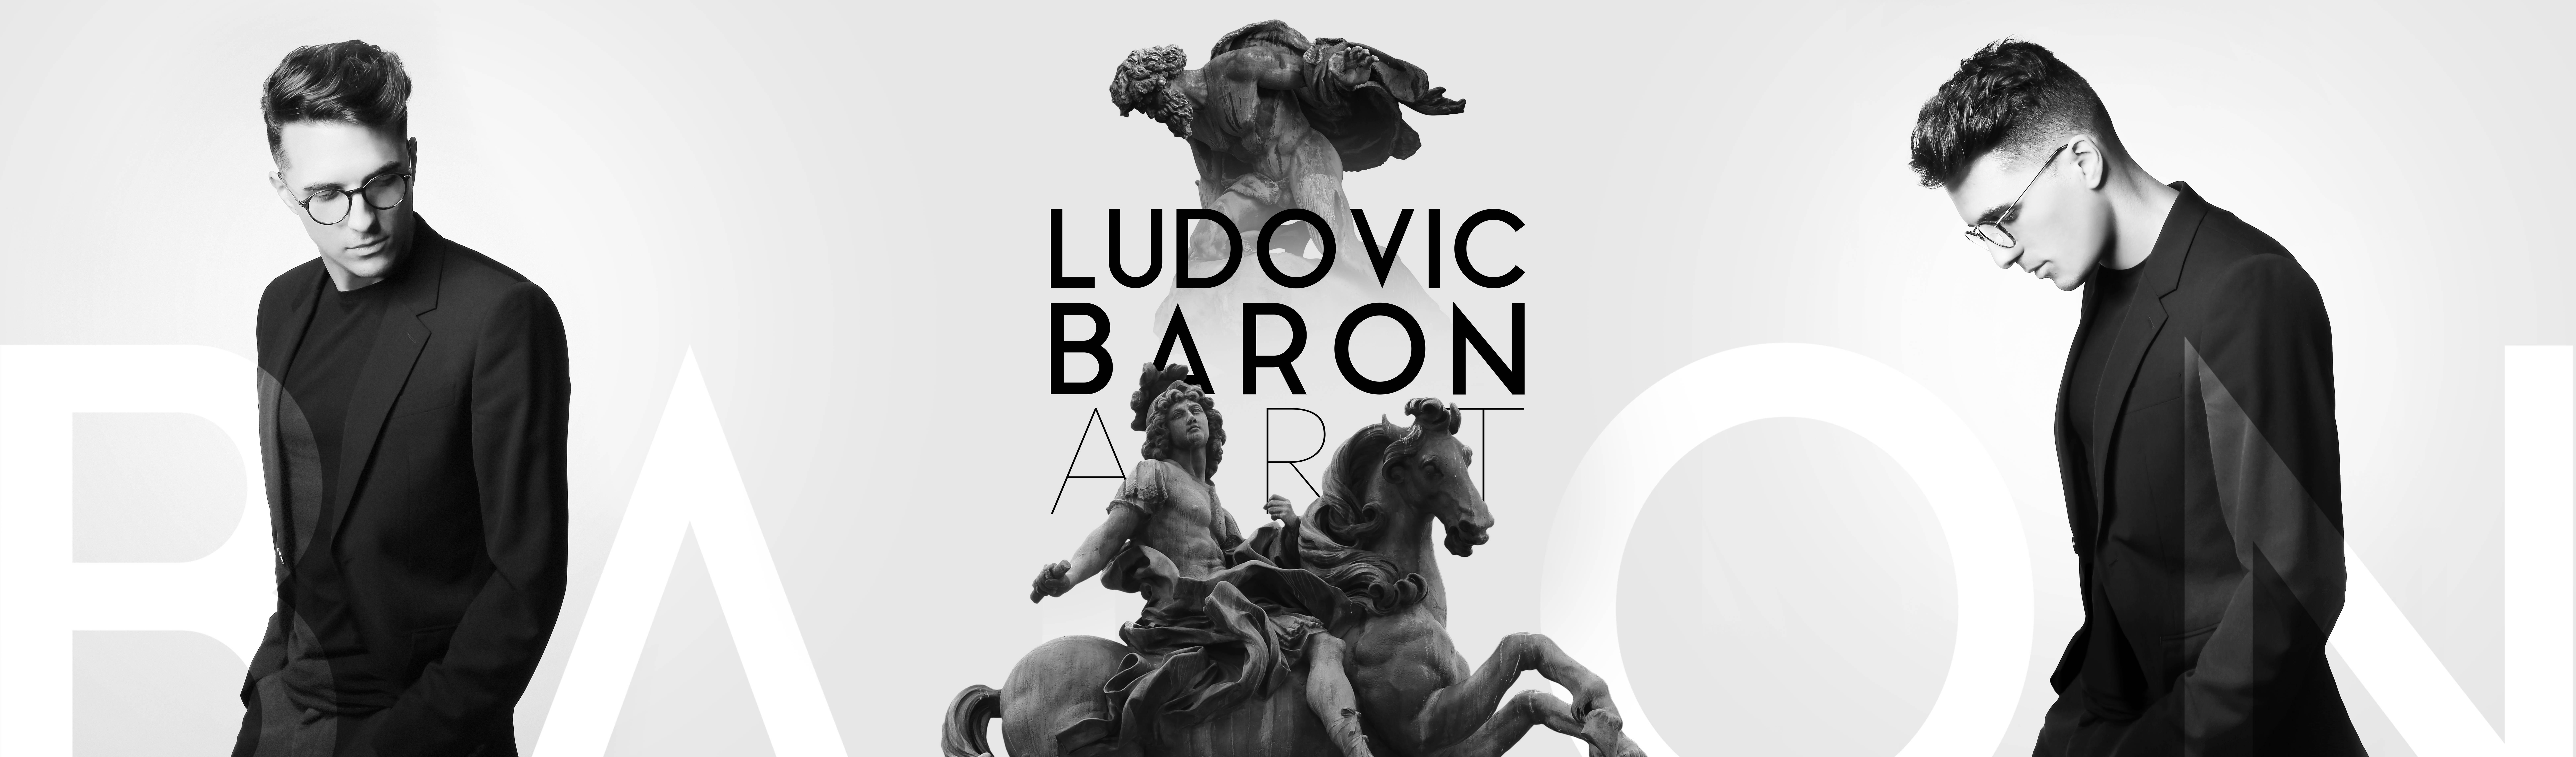 Ludovic Baron Artiste Photographe